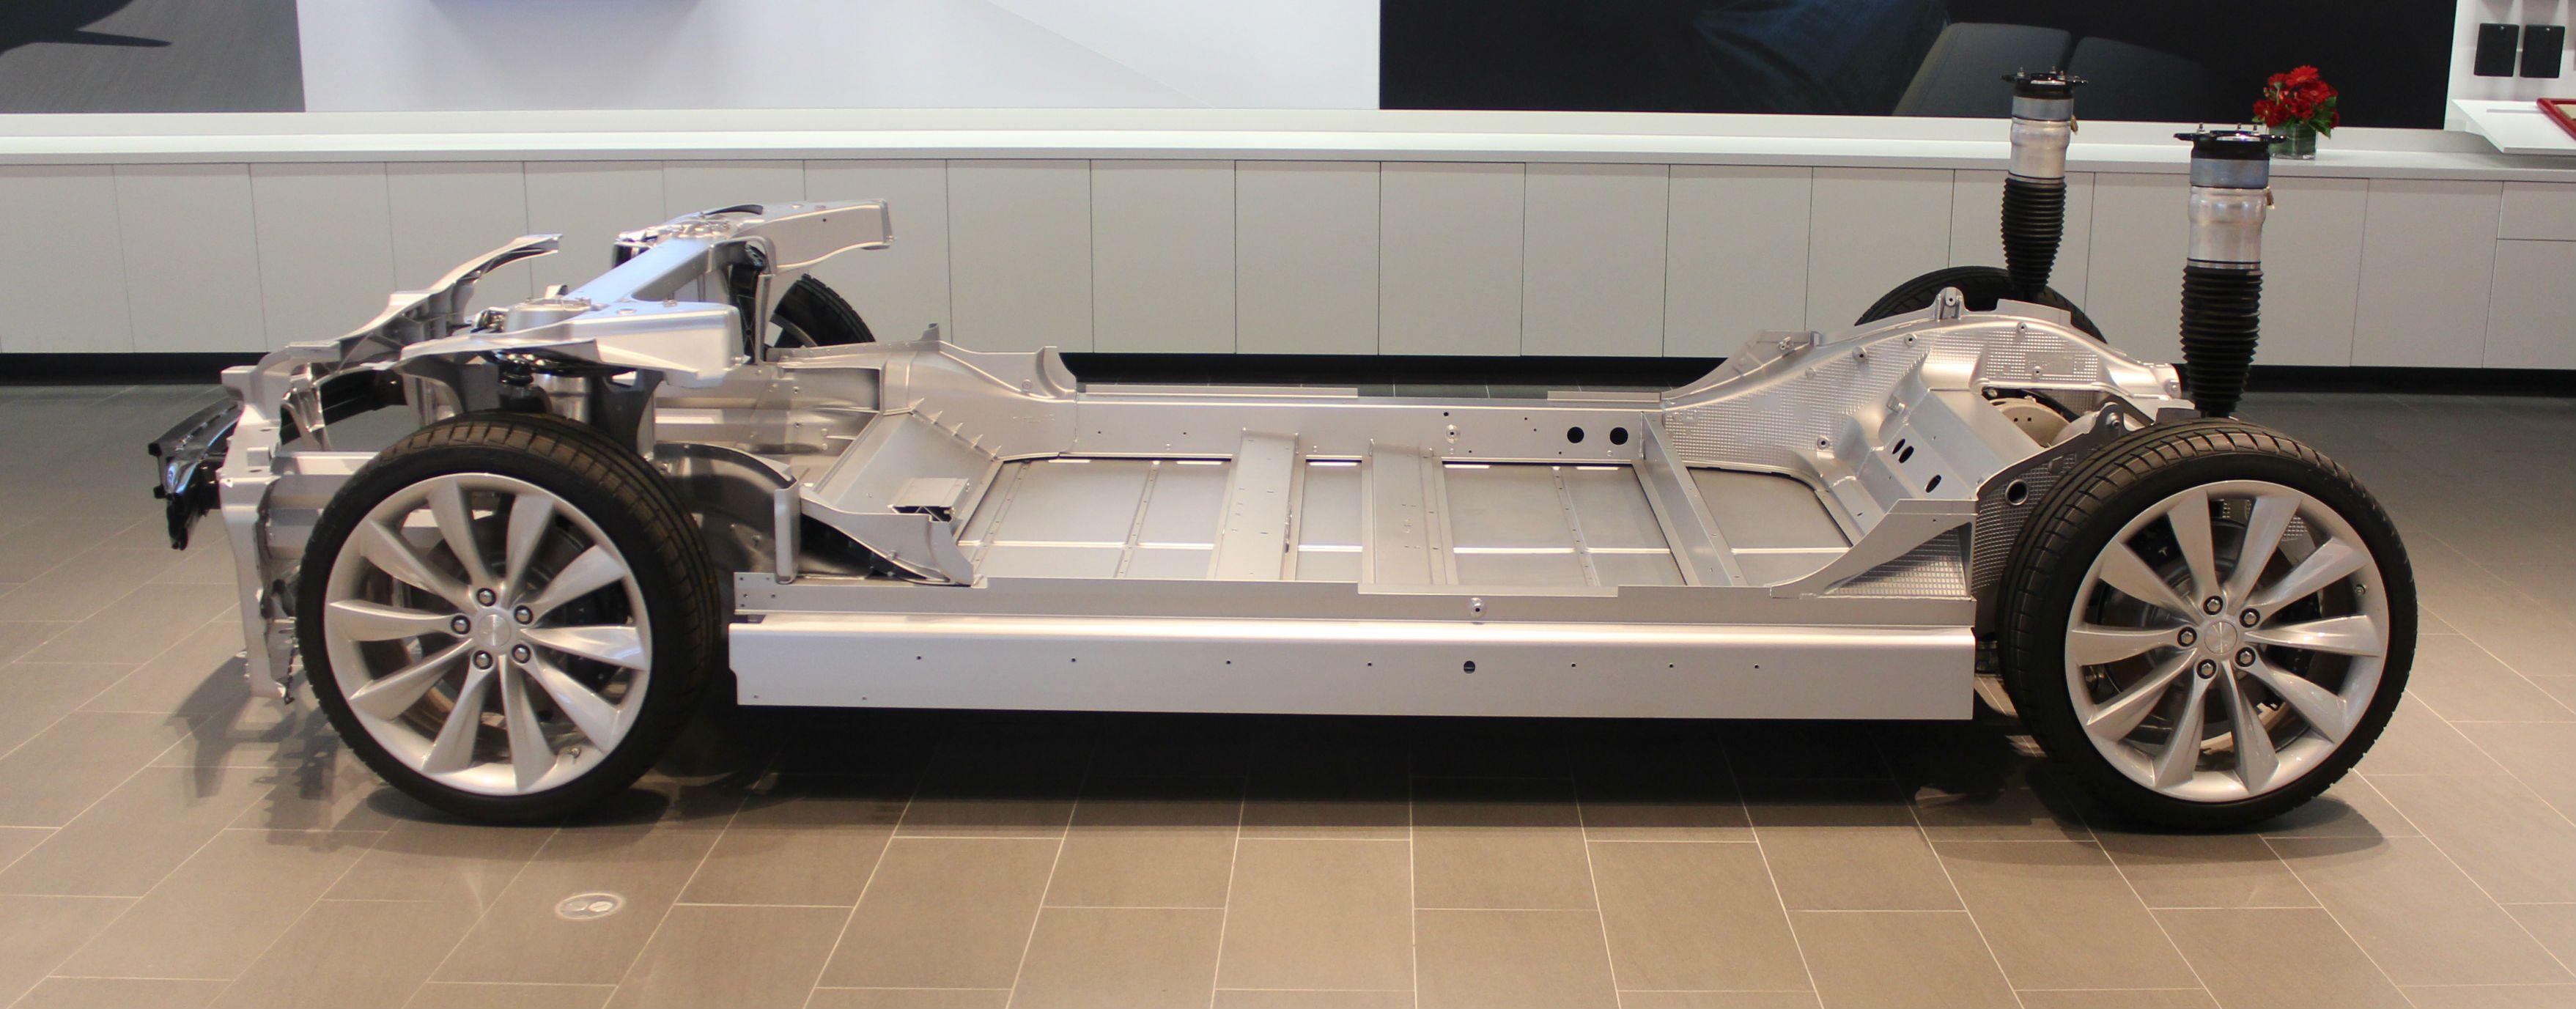 Tesla Model S Drive Train Lessonator